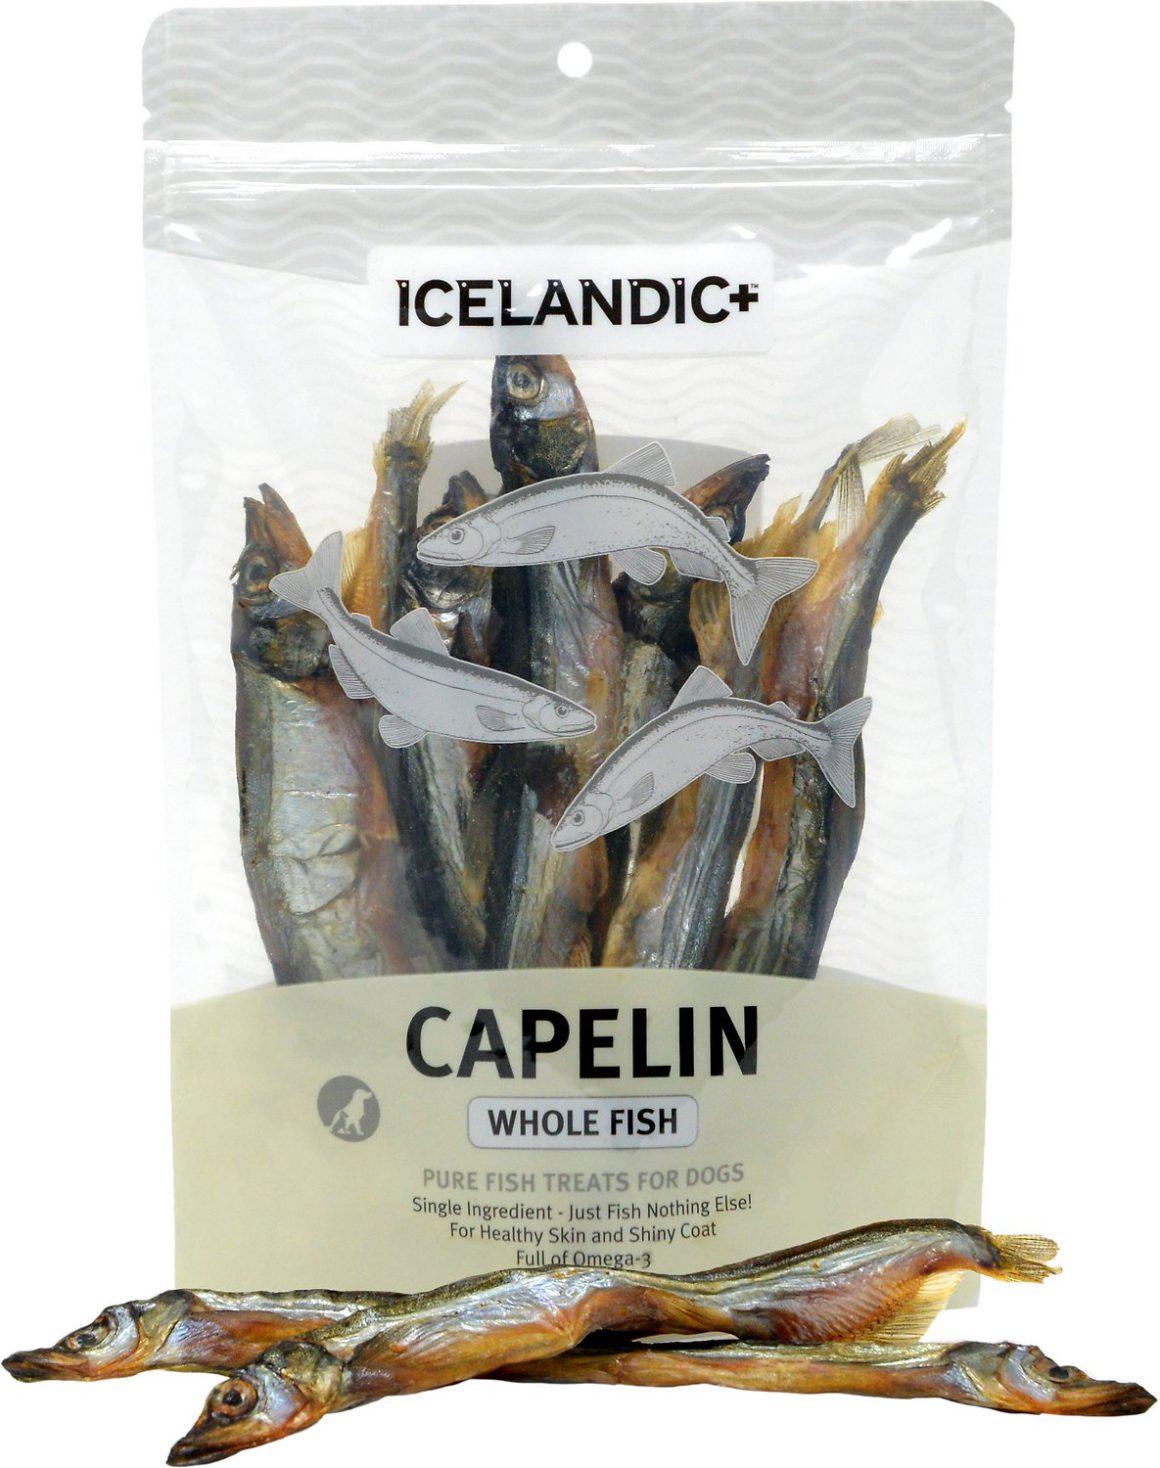 Icelandic+ Capelin Whole Fish & Pieces